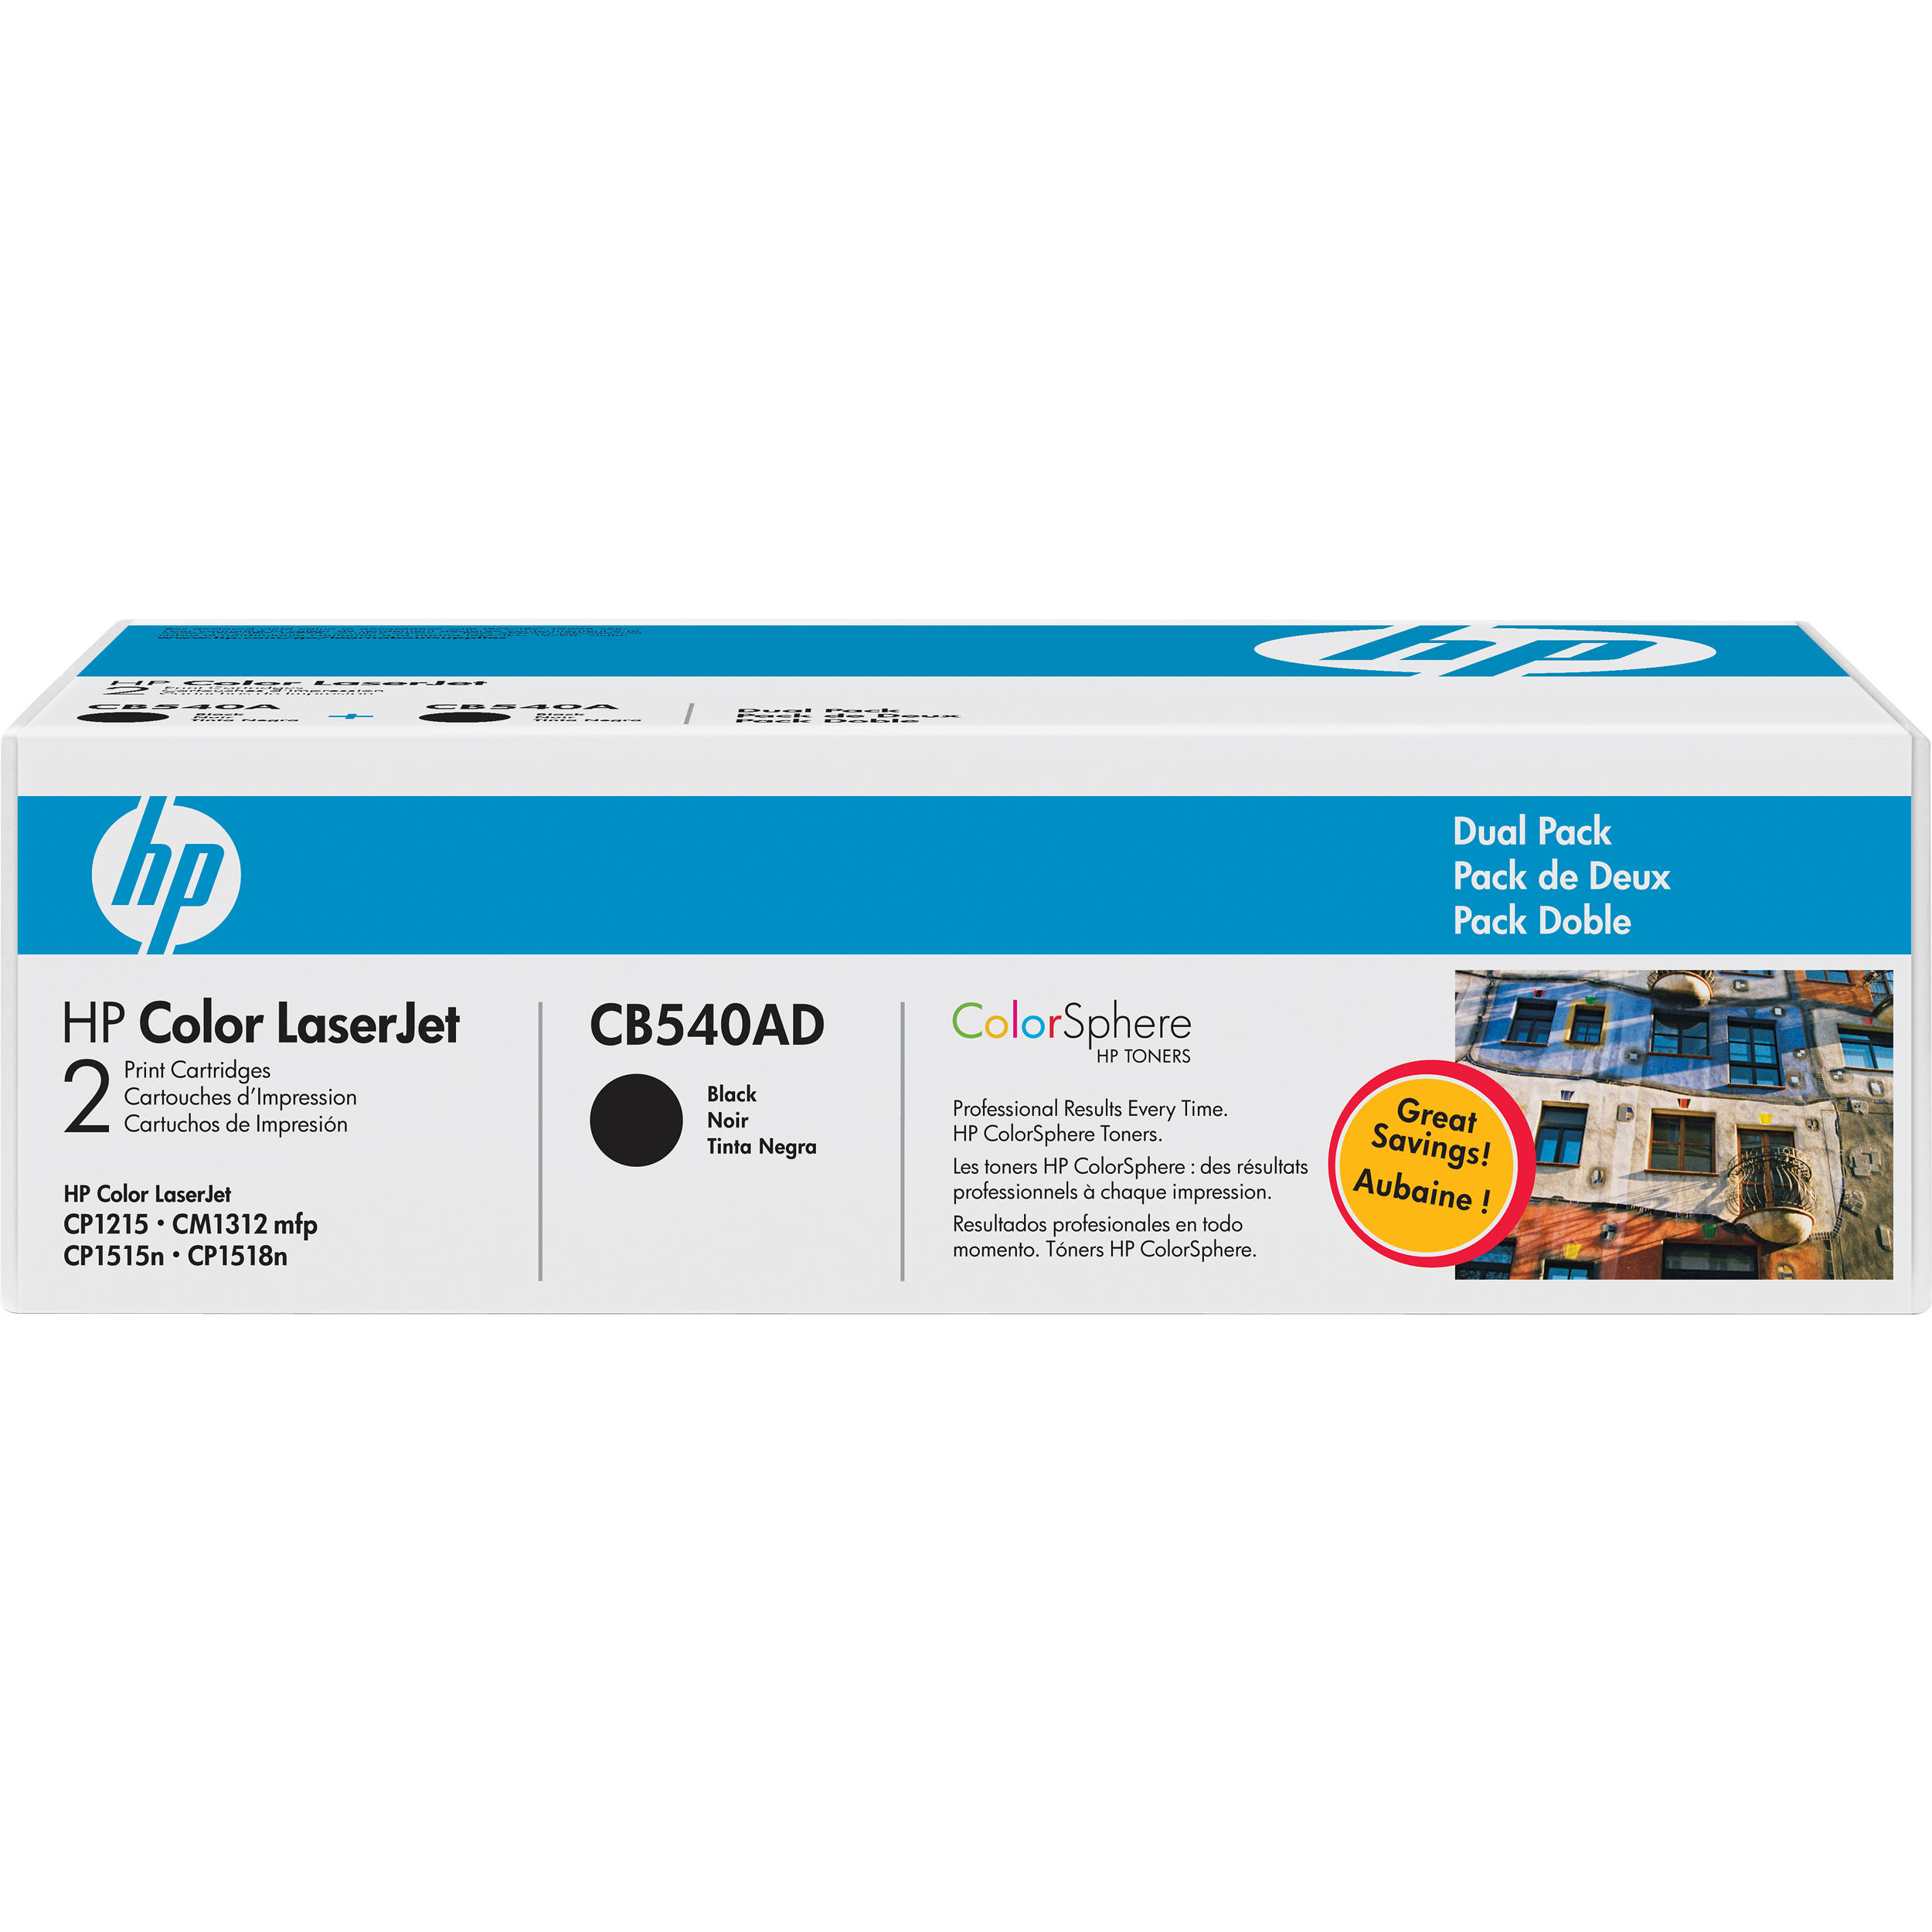 HP Color LaserJet 125A Black Toner Cartridge Dual Pack (CB540AD) 91da340425